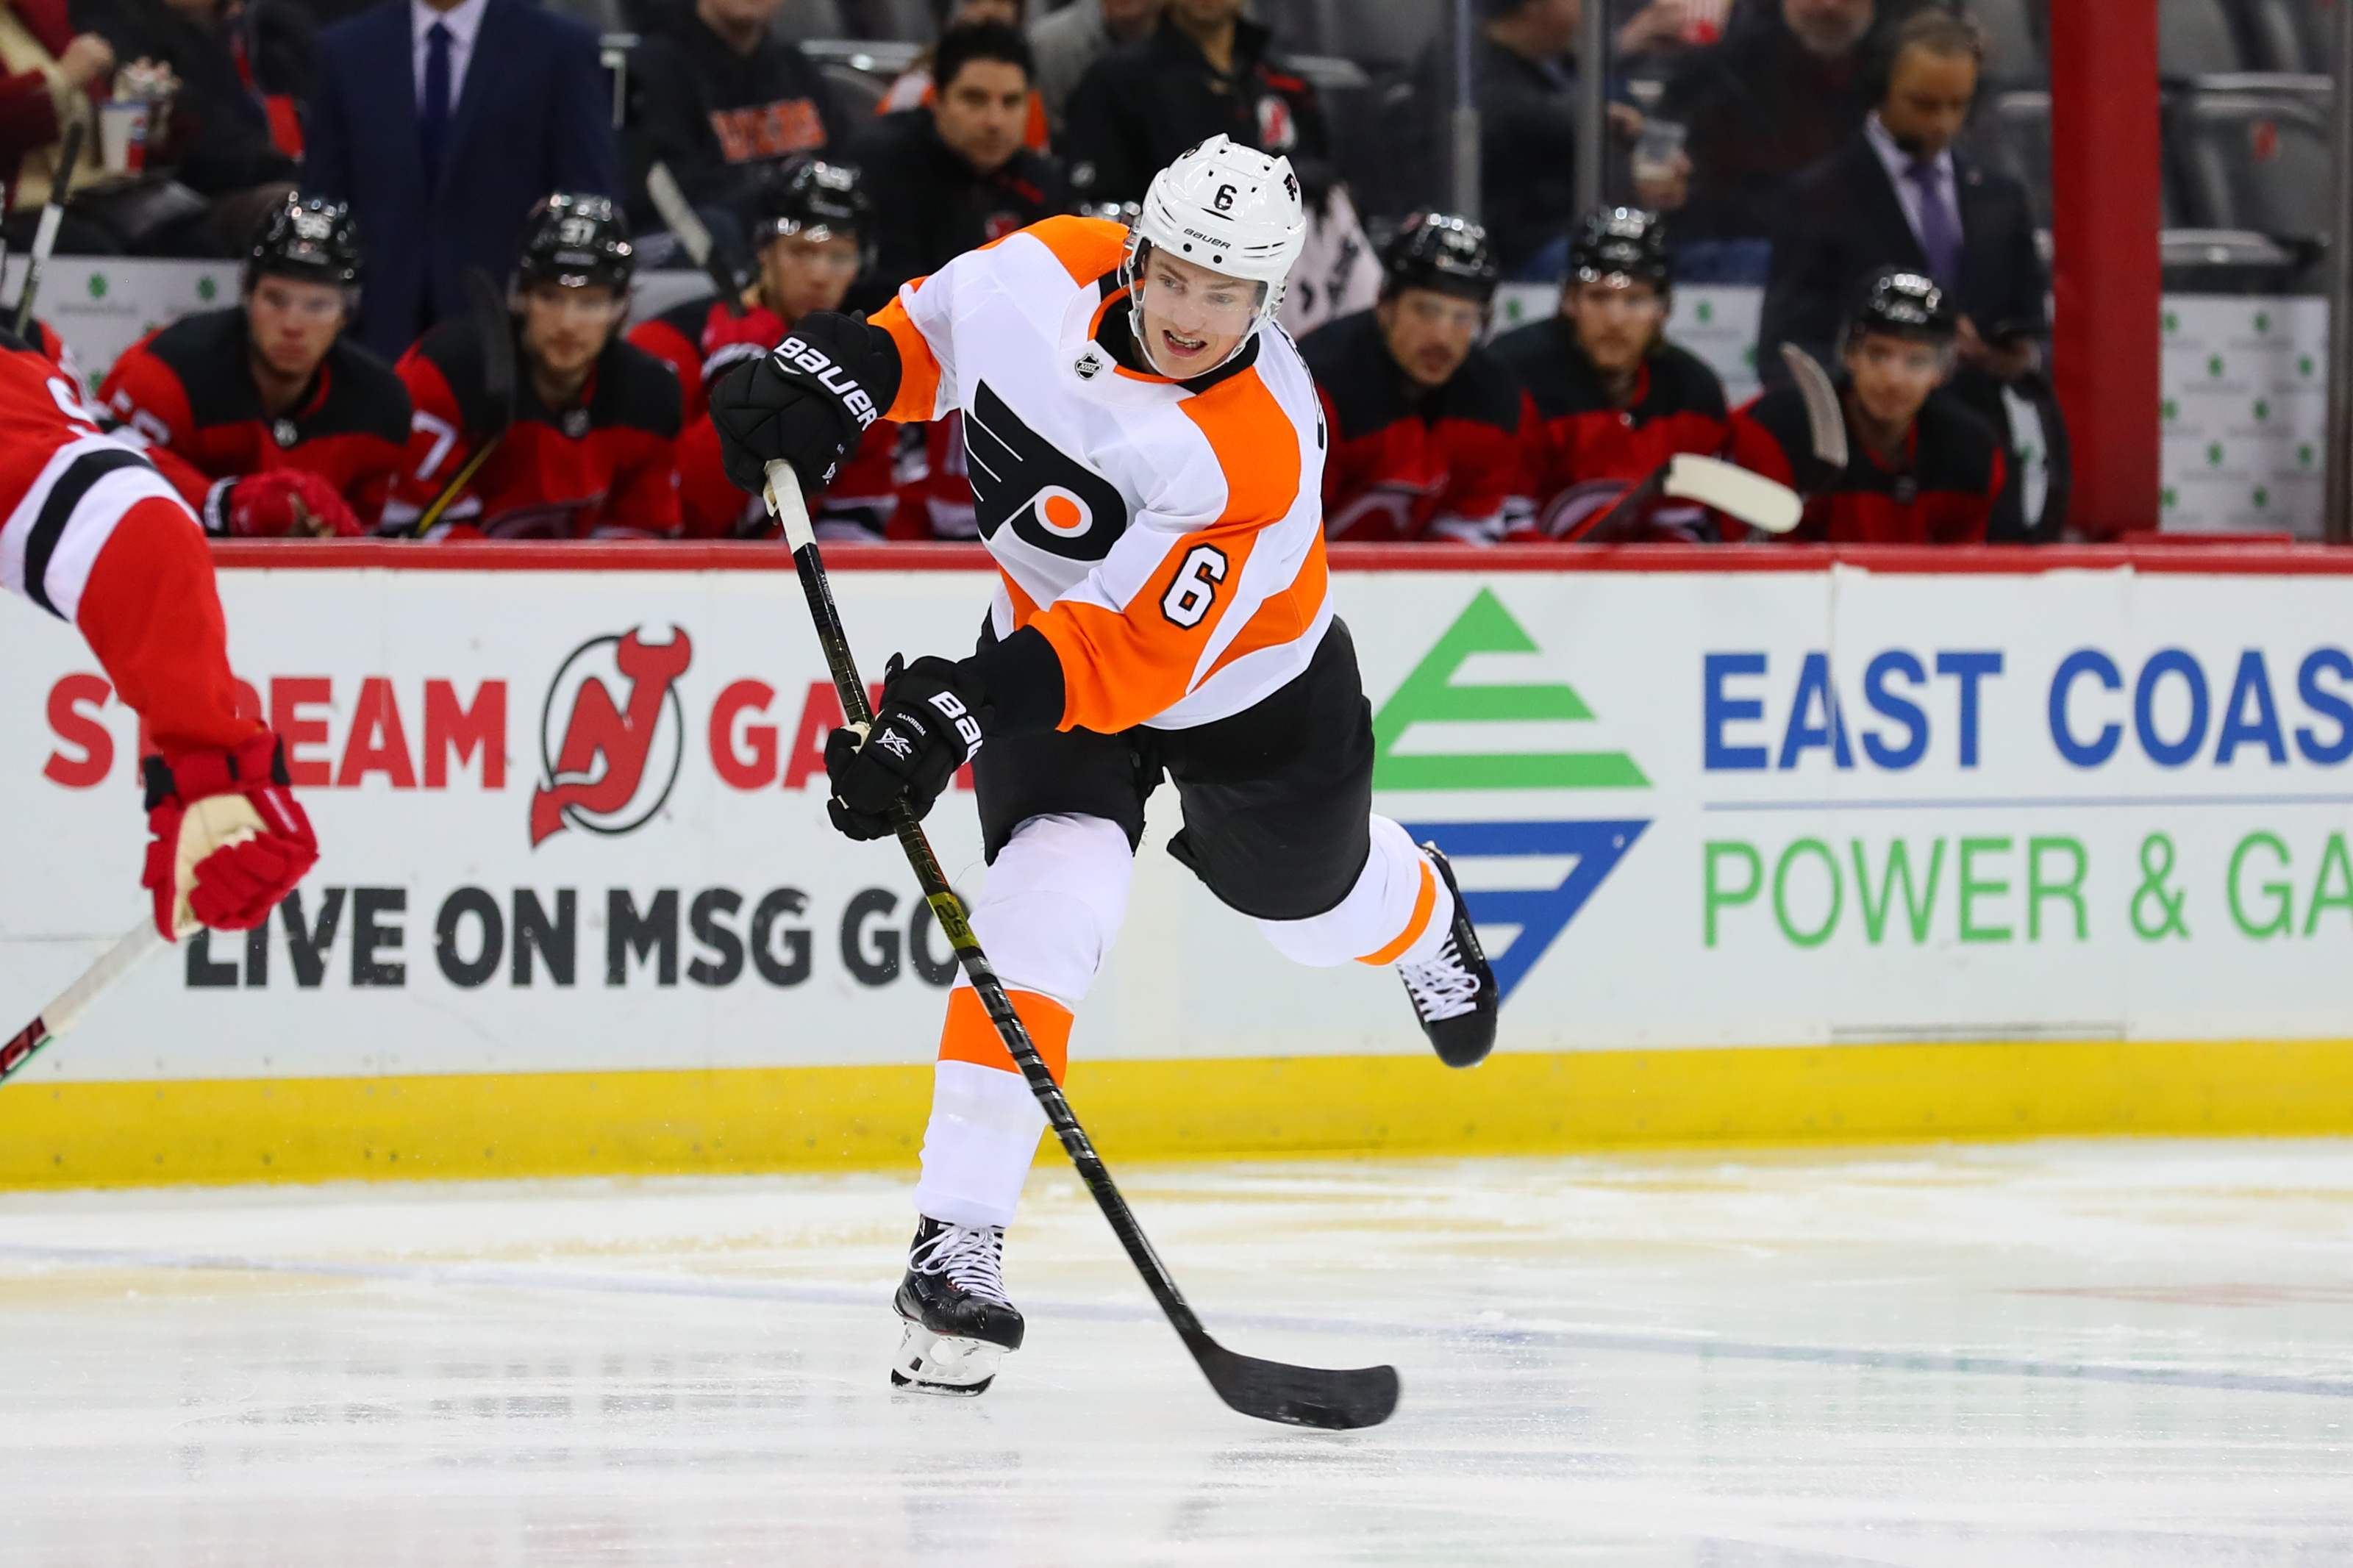 Philadelphia Flyers Daily Fantasy: Travis Sanheim A Great Value Pick Tonight